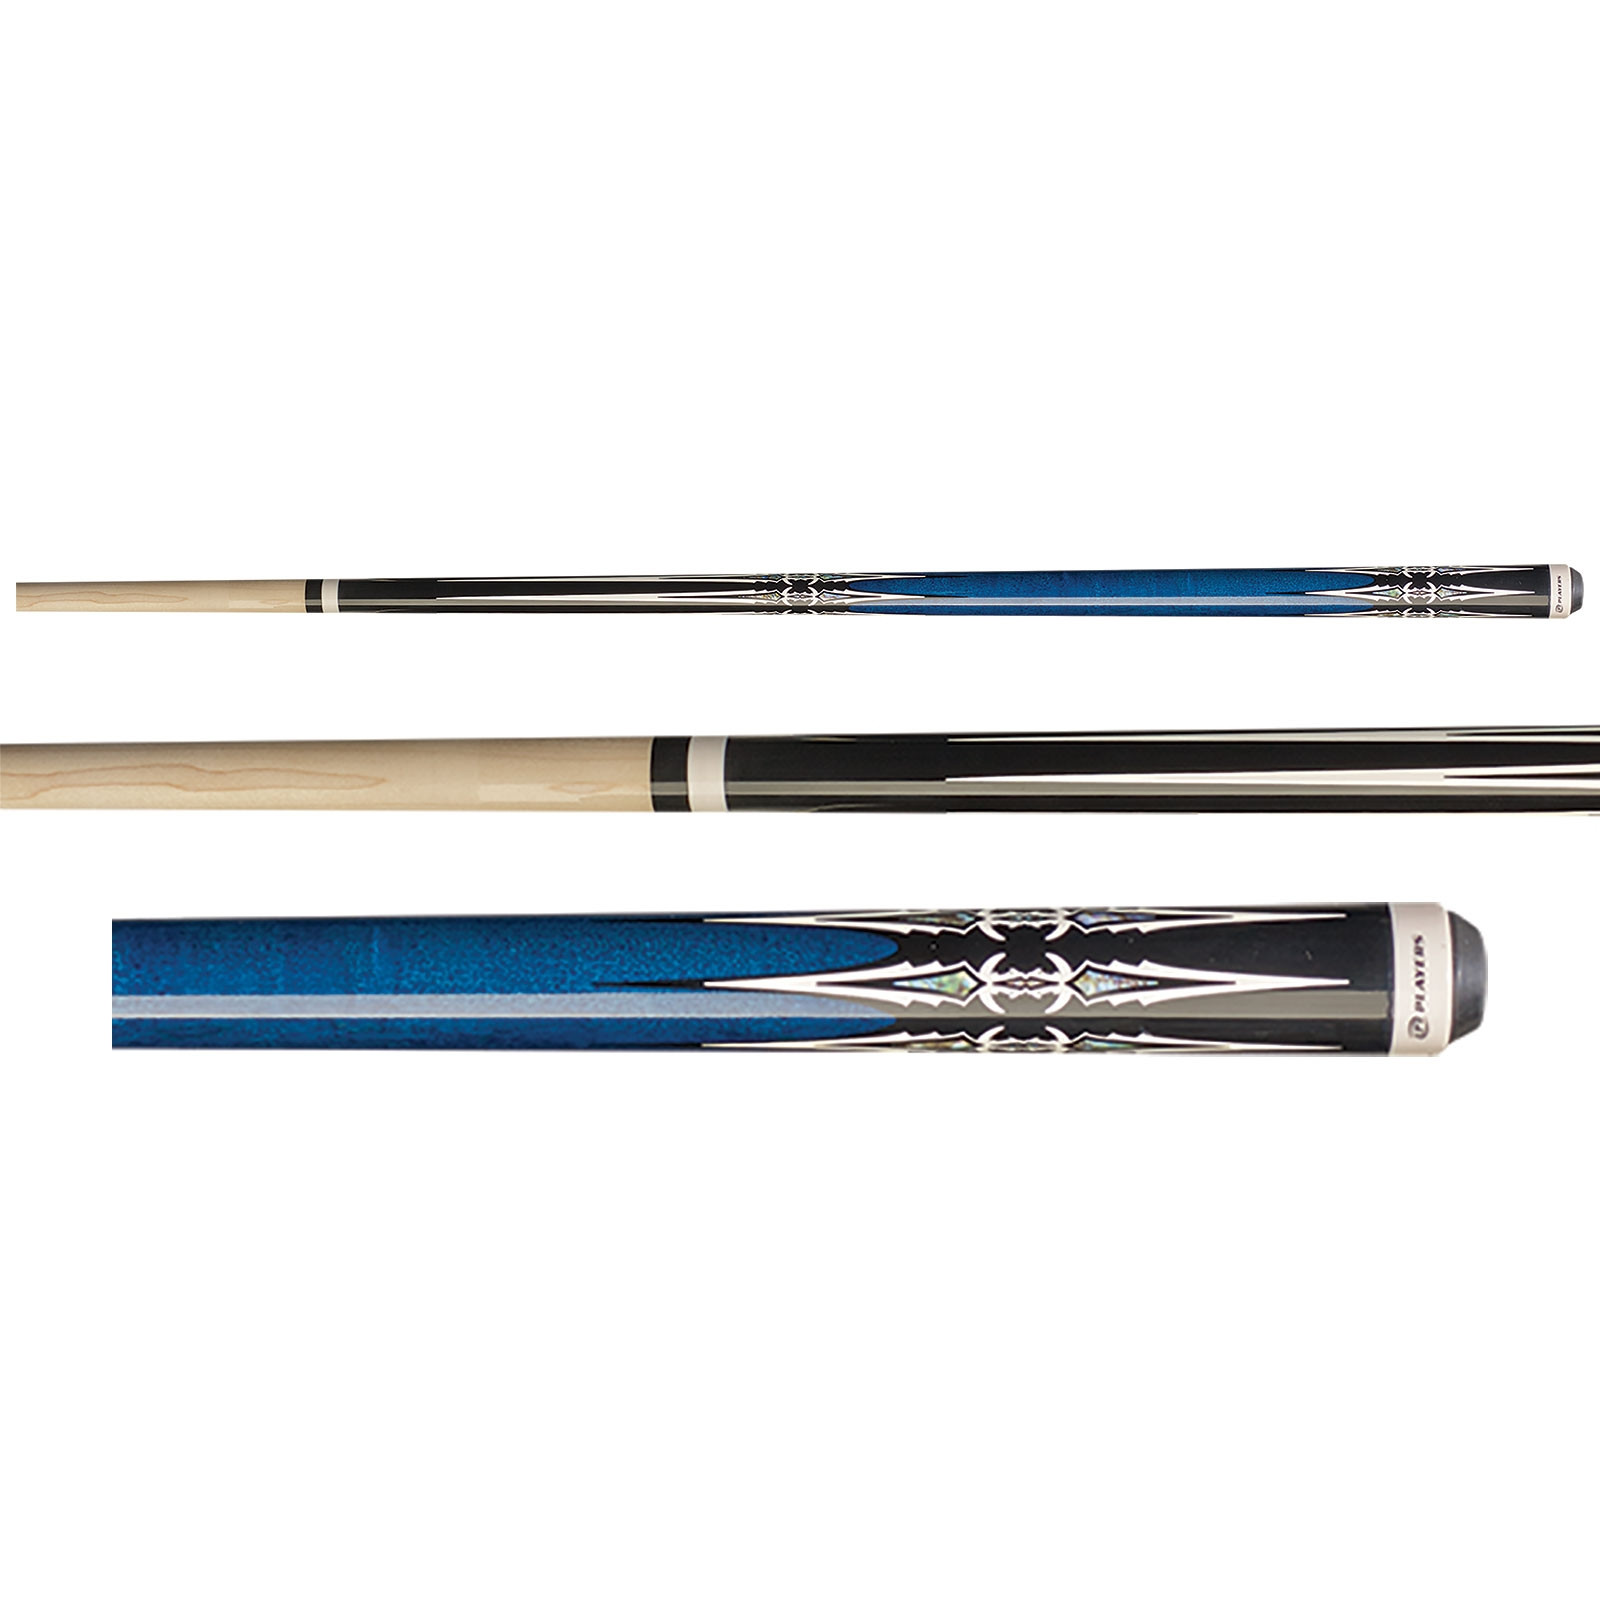 Players G-4113 Cobalt Blue Pool Cue Stick